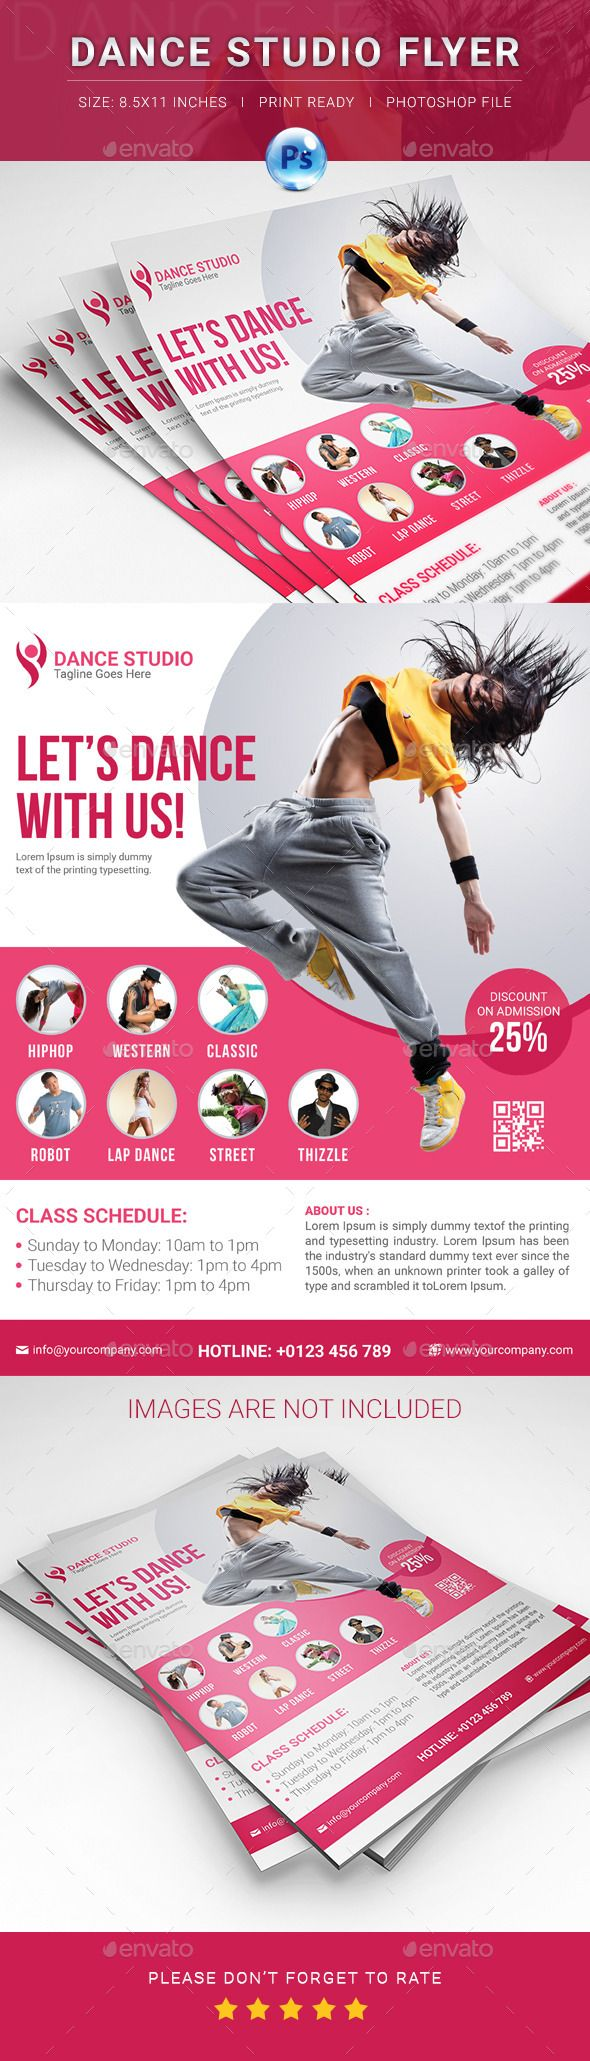 dance studio flyer template psd design download http